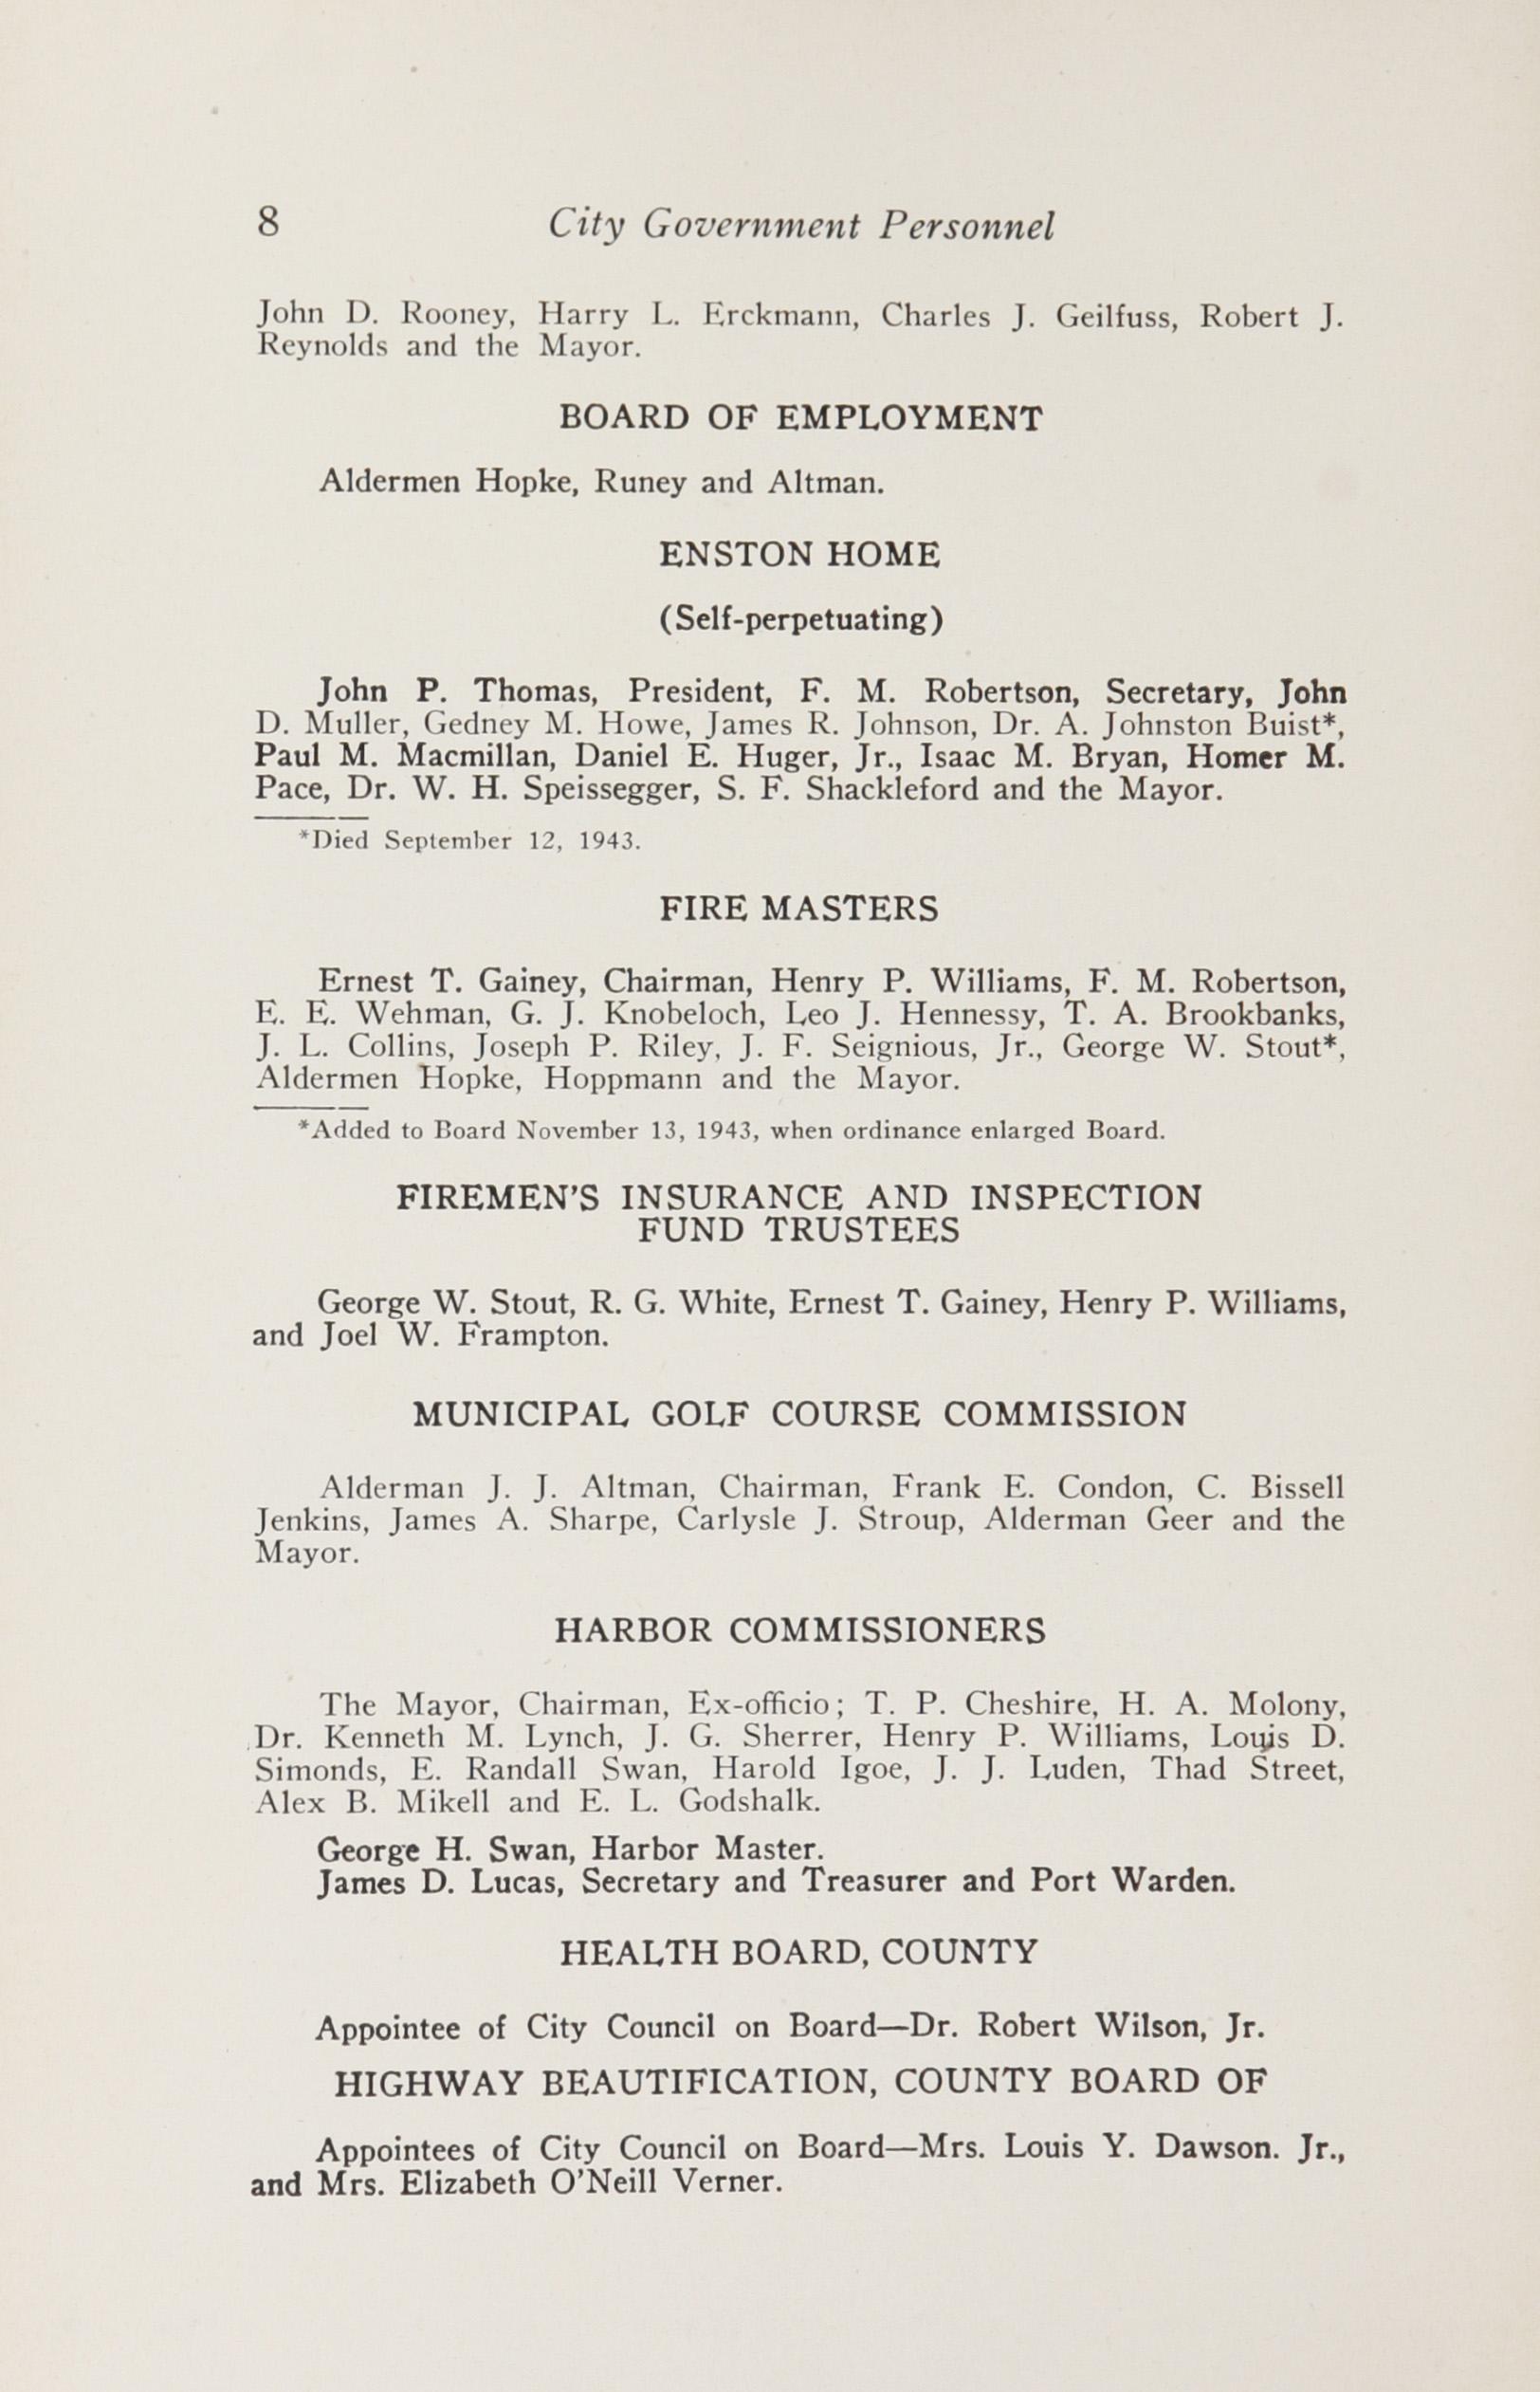 Charleston Yearbook, 1943, page 8